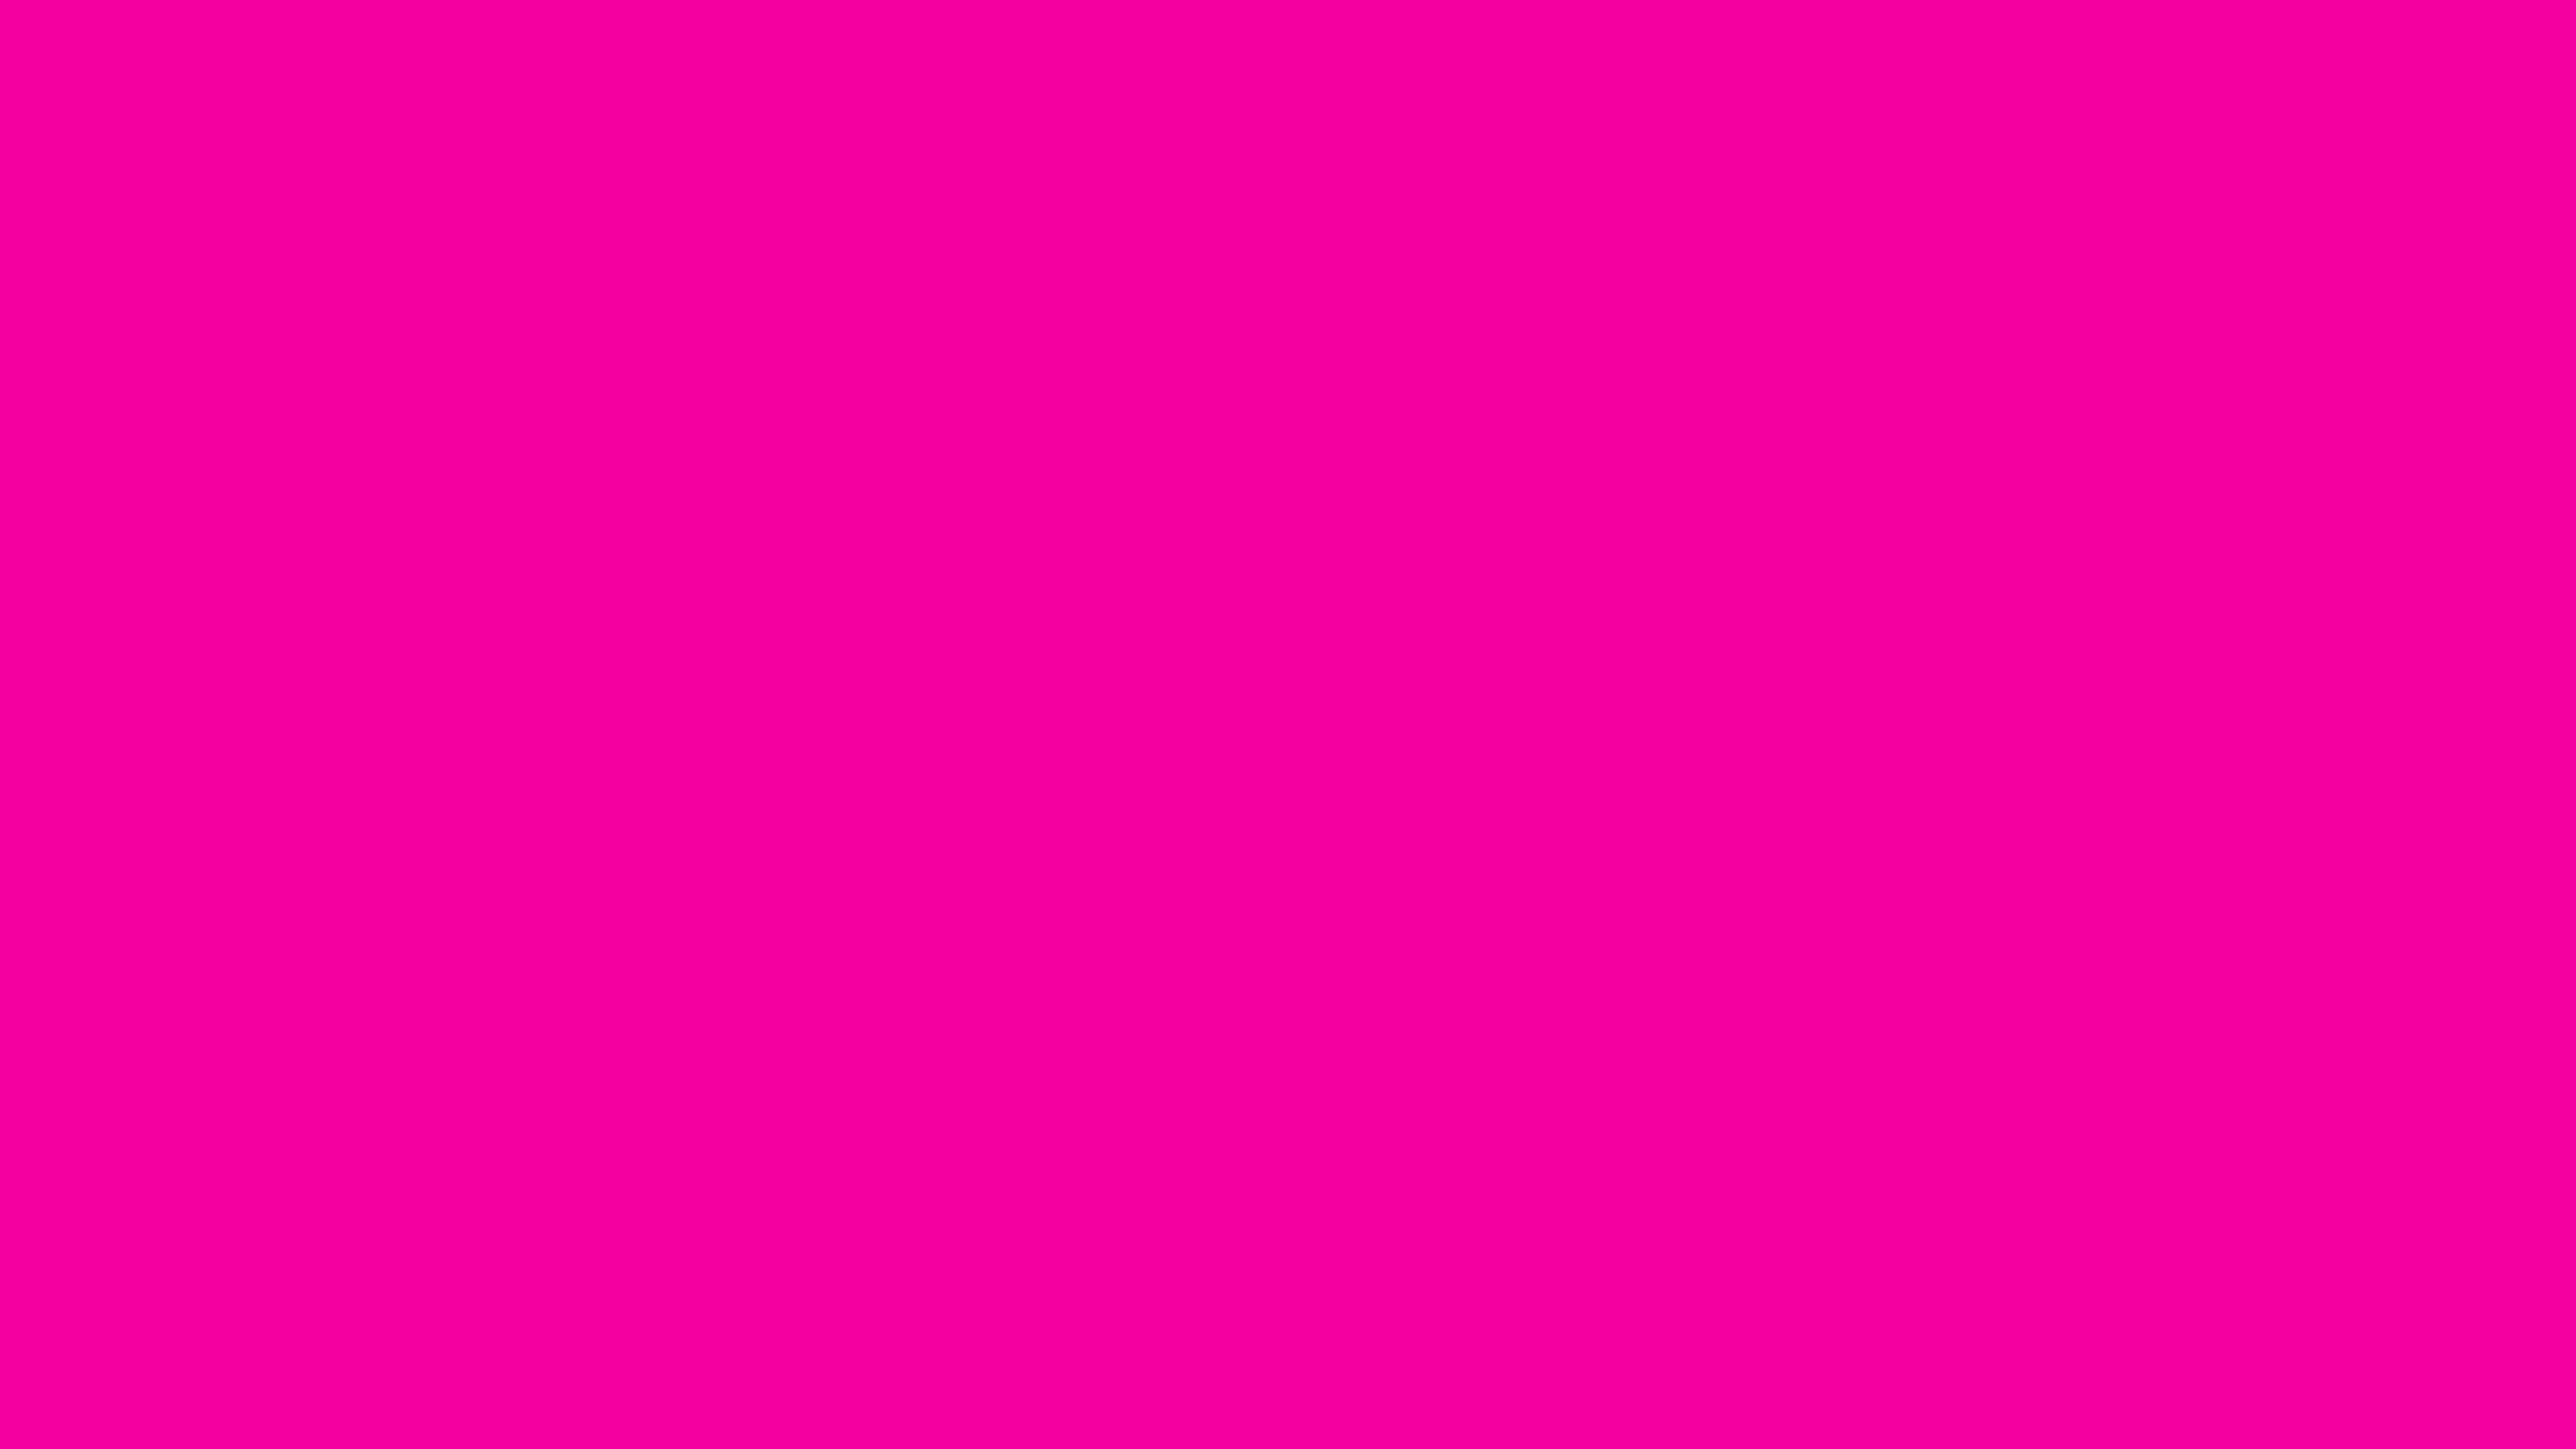 3840x2160 Fashion Fuchsia Solid Color Background